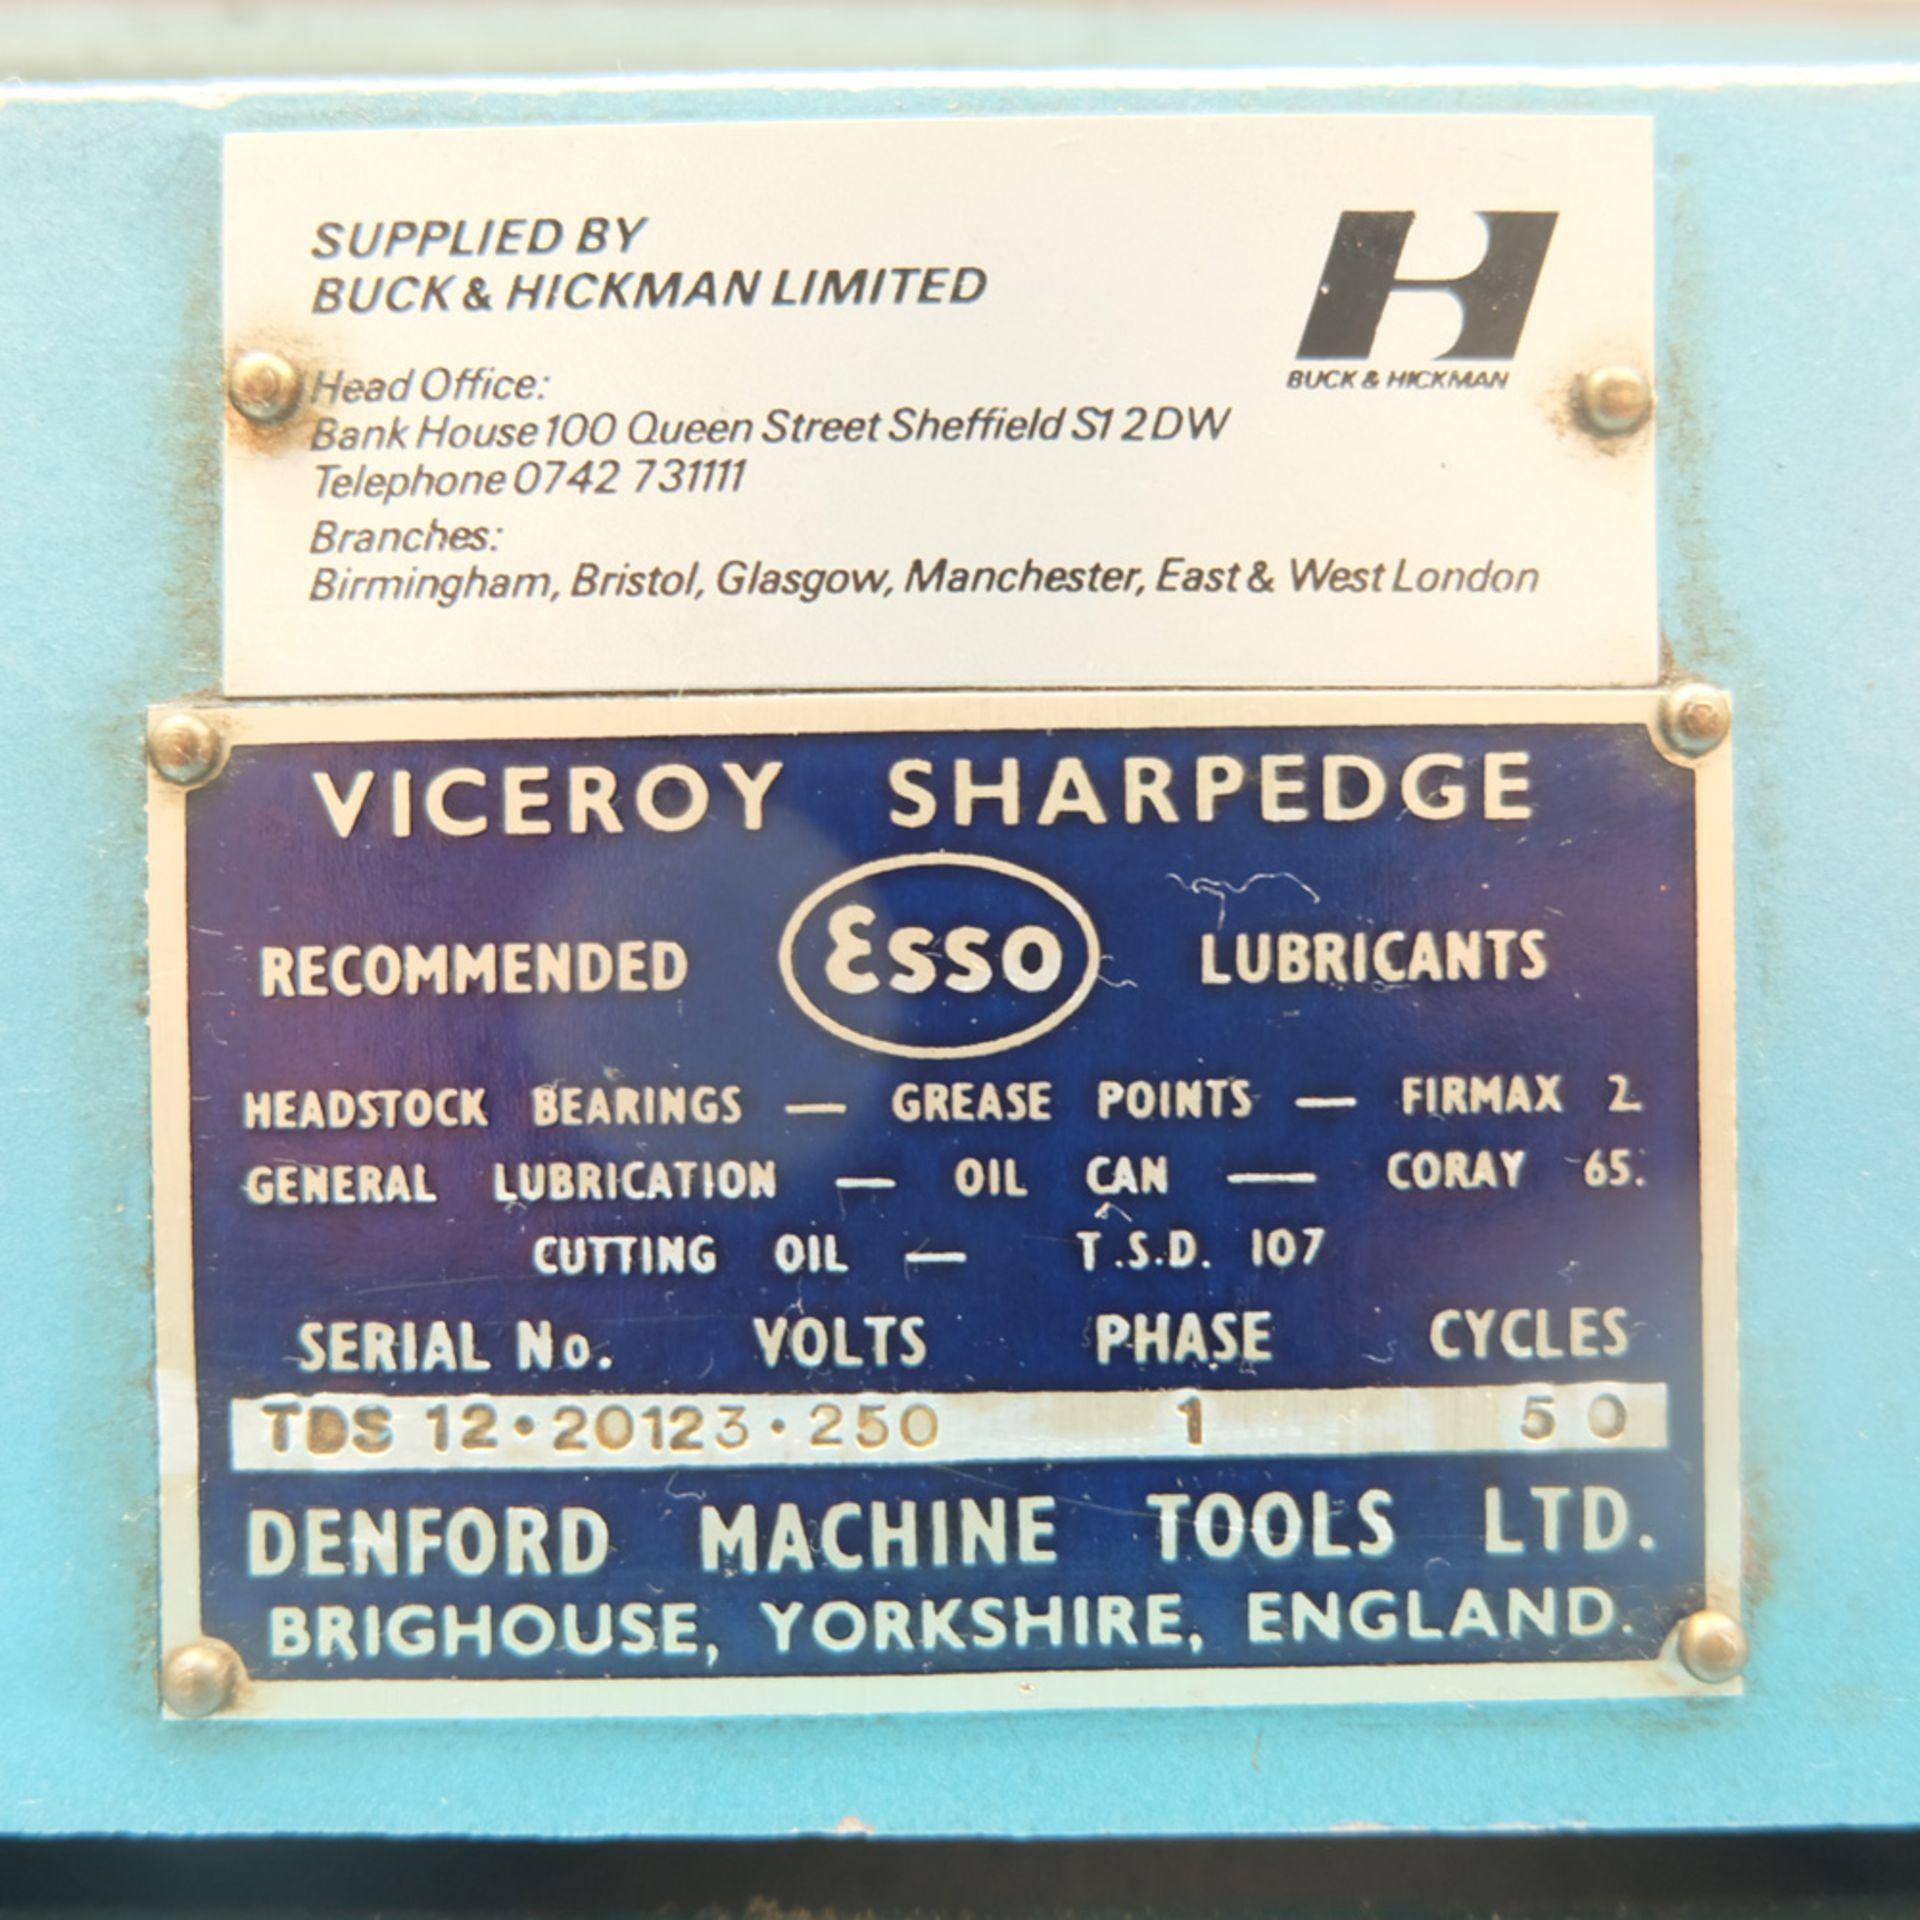 Viceroy Sharpedge Model TDS 12/16 Edge Tool Sharpening Machine. - Image 5 of 6